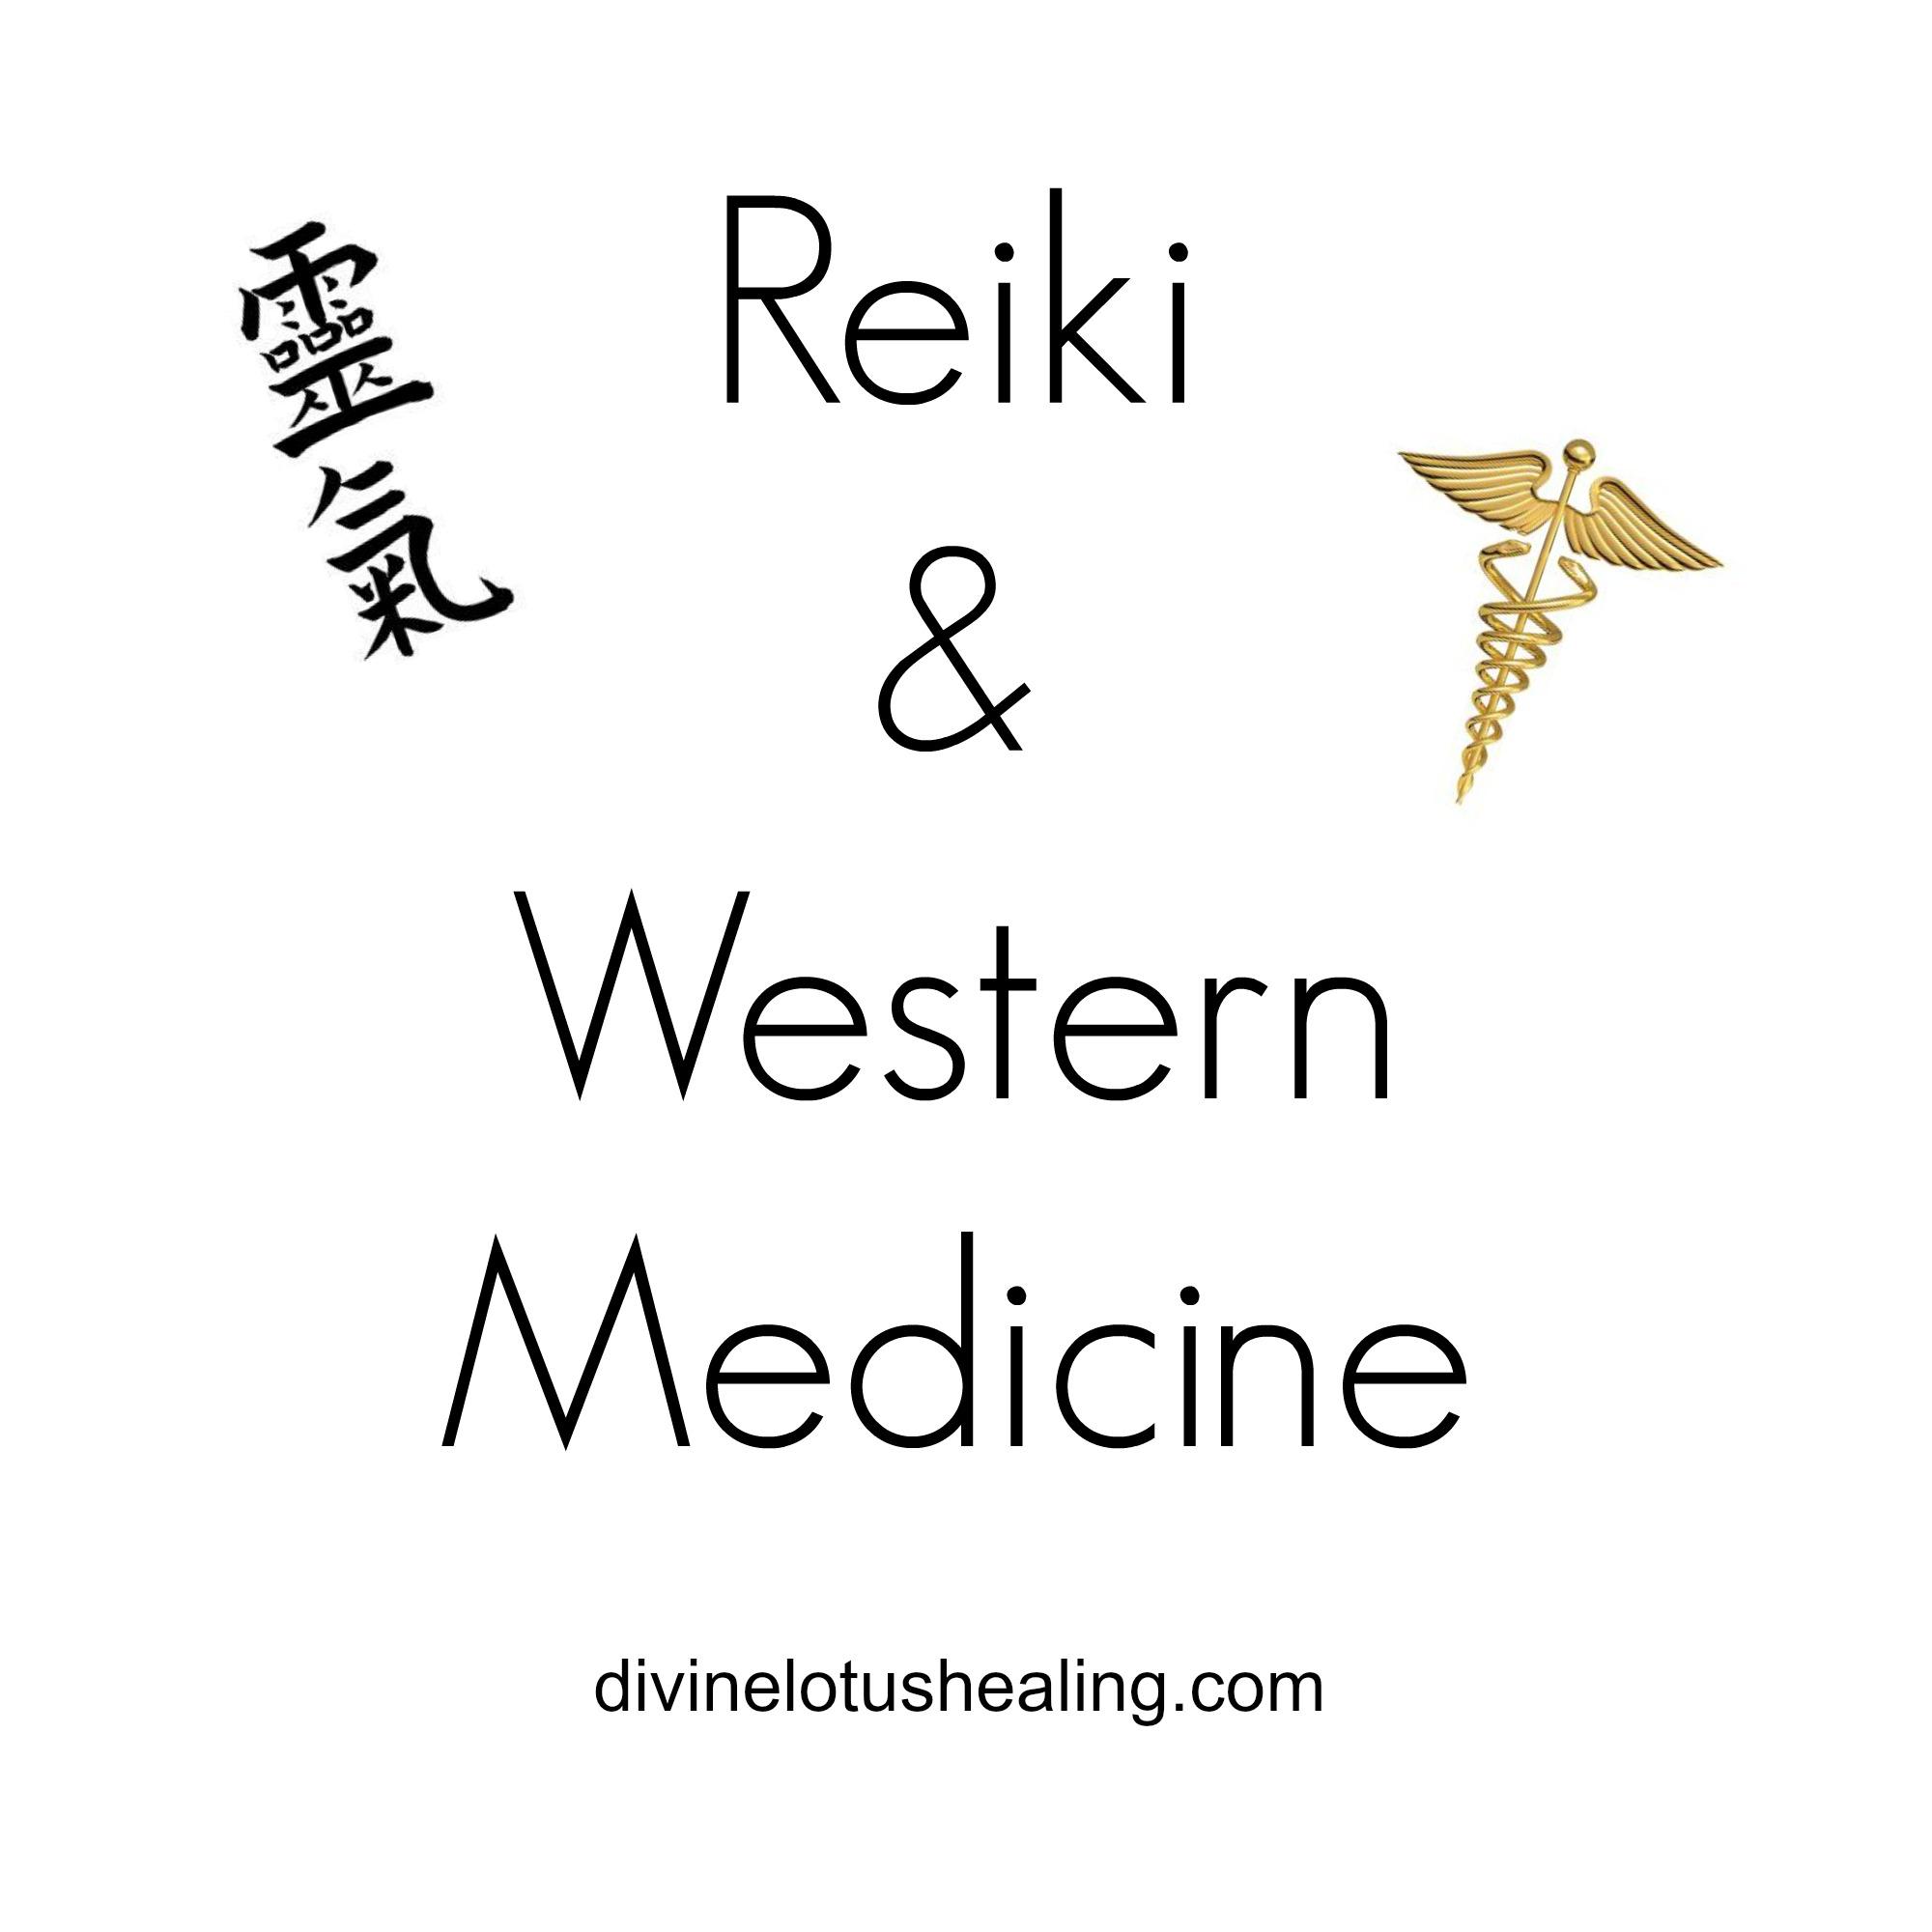 Divine Lotus Healing | Reiki and Western Medicine